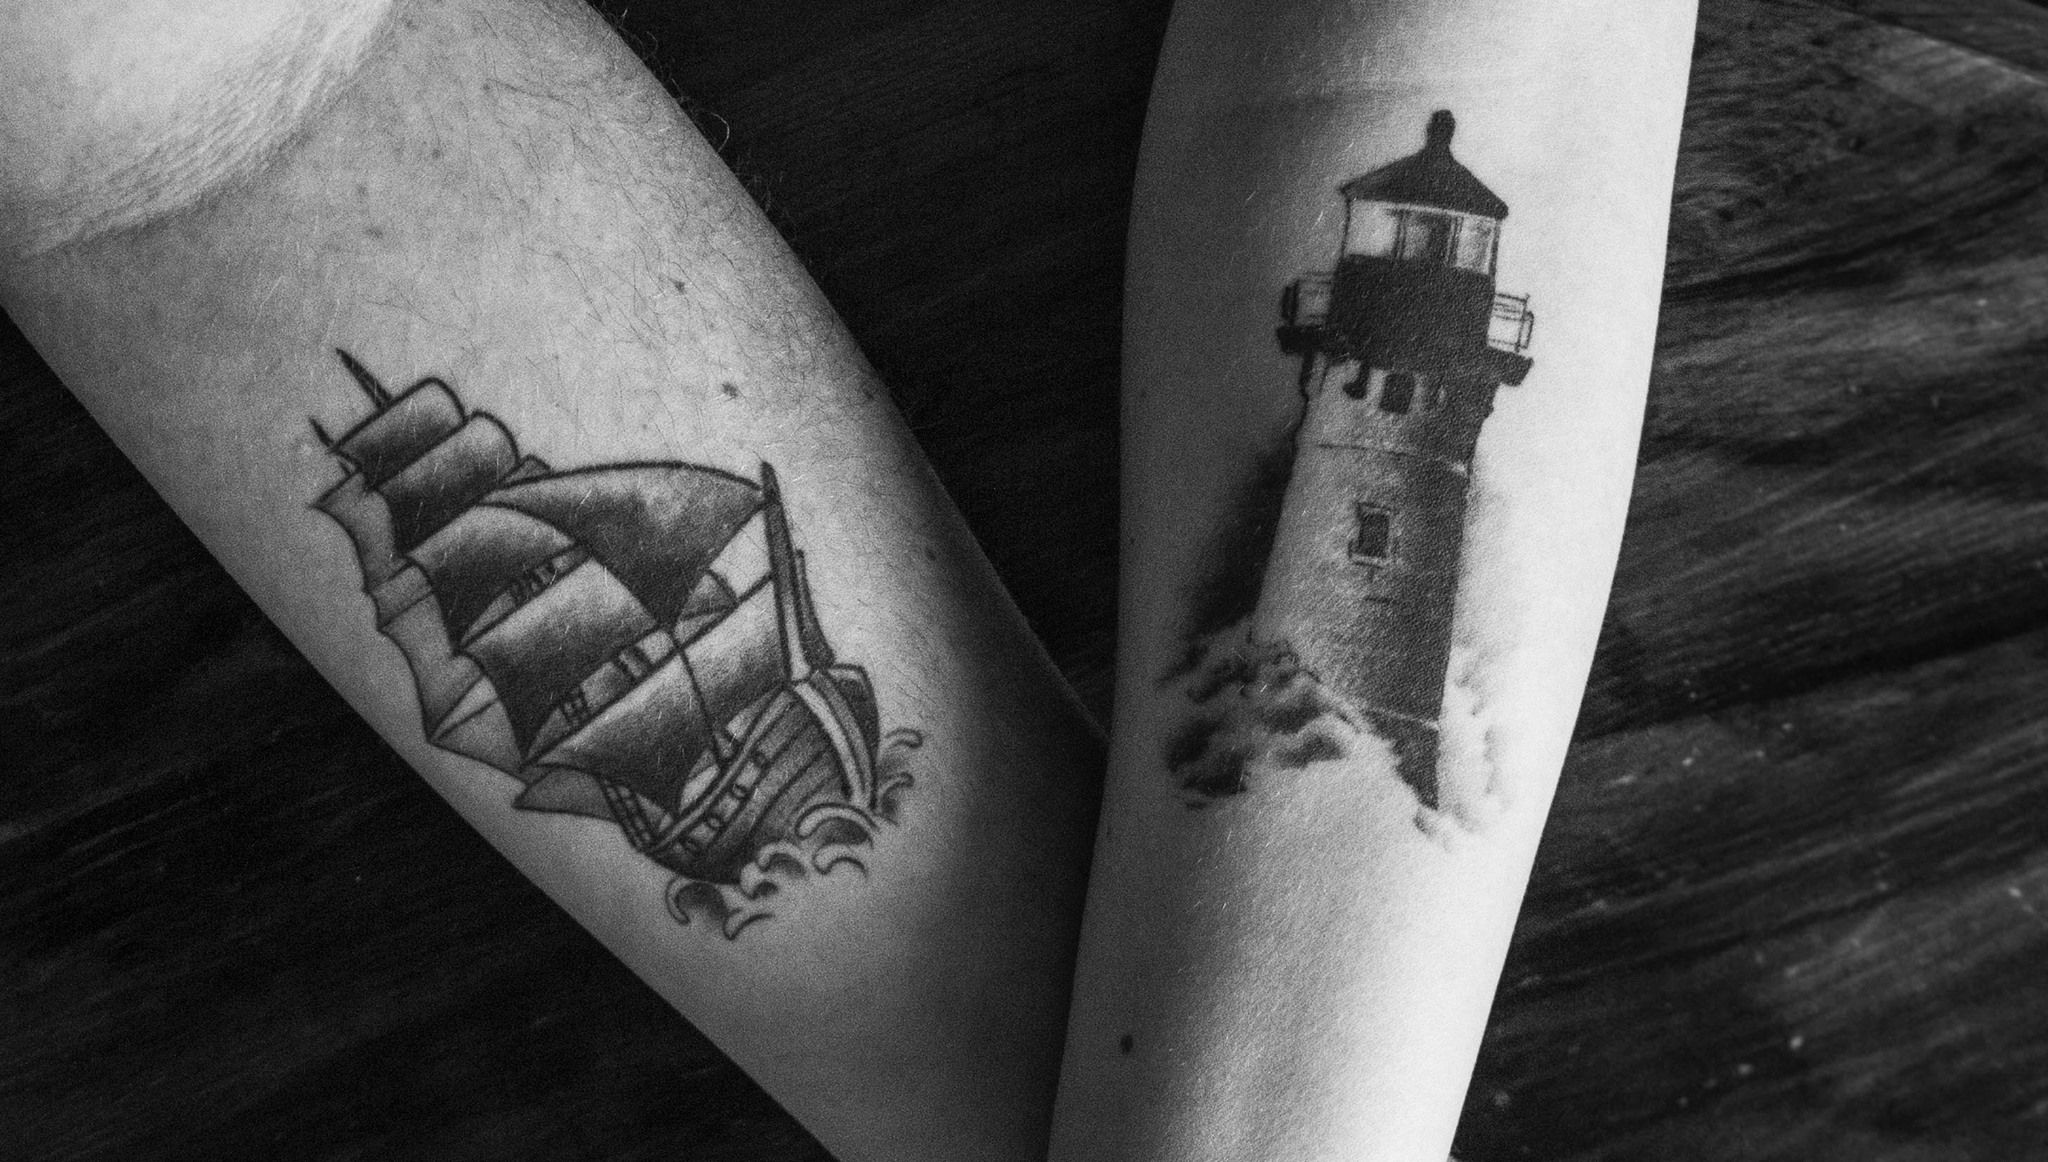 2b34fca0e Couple tattoo, light house tattoo, ship tattoo, black and white ...